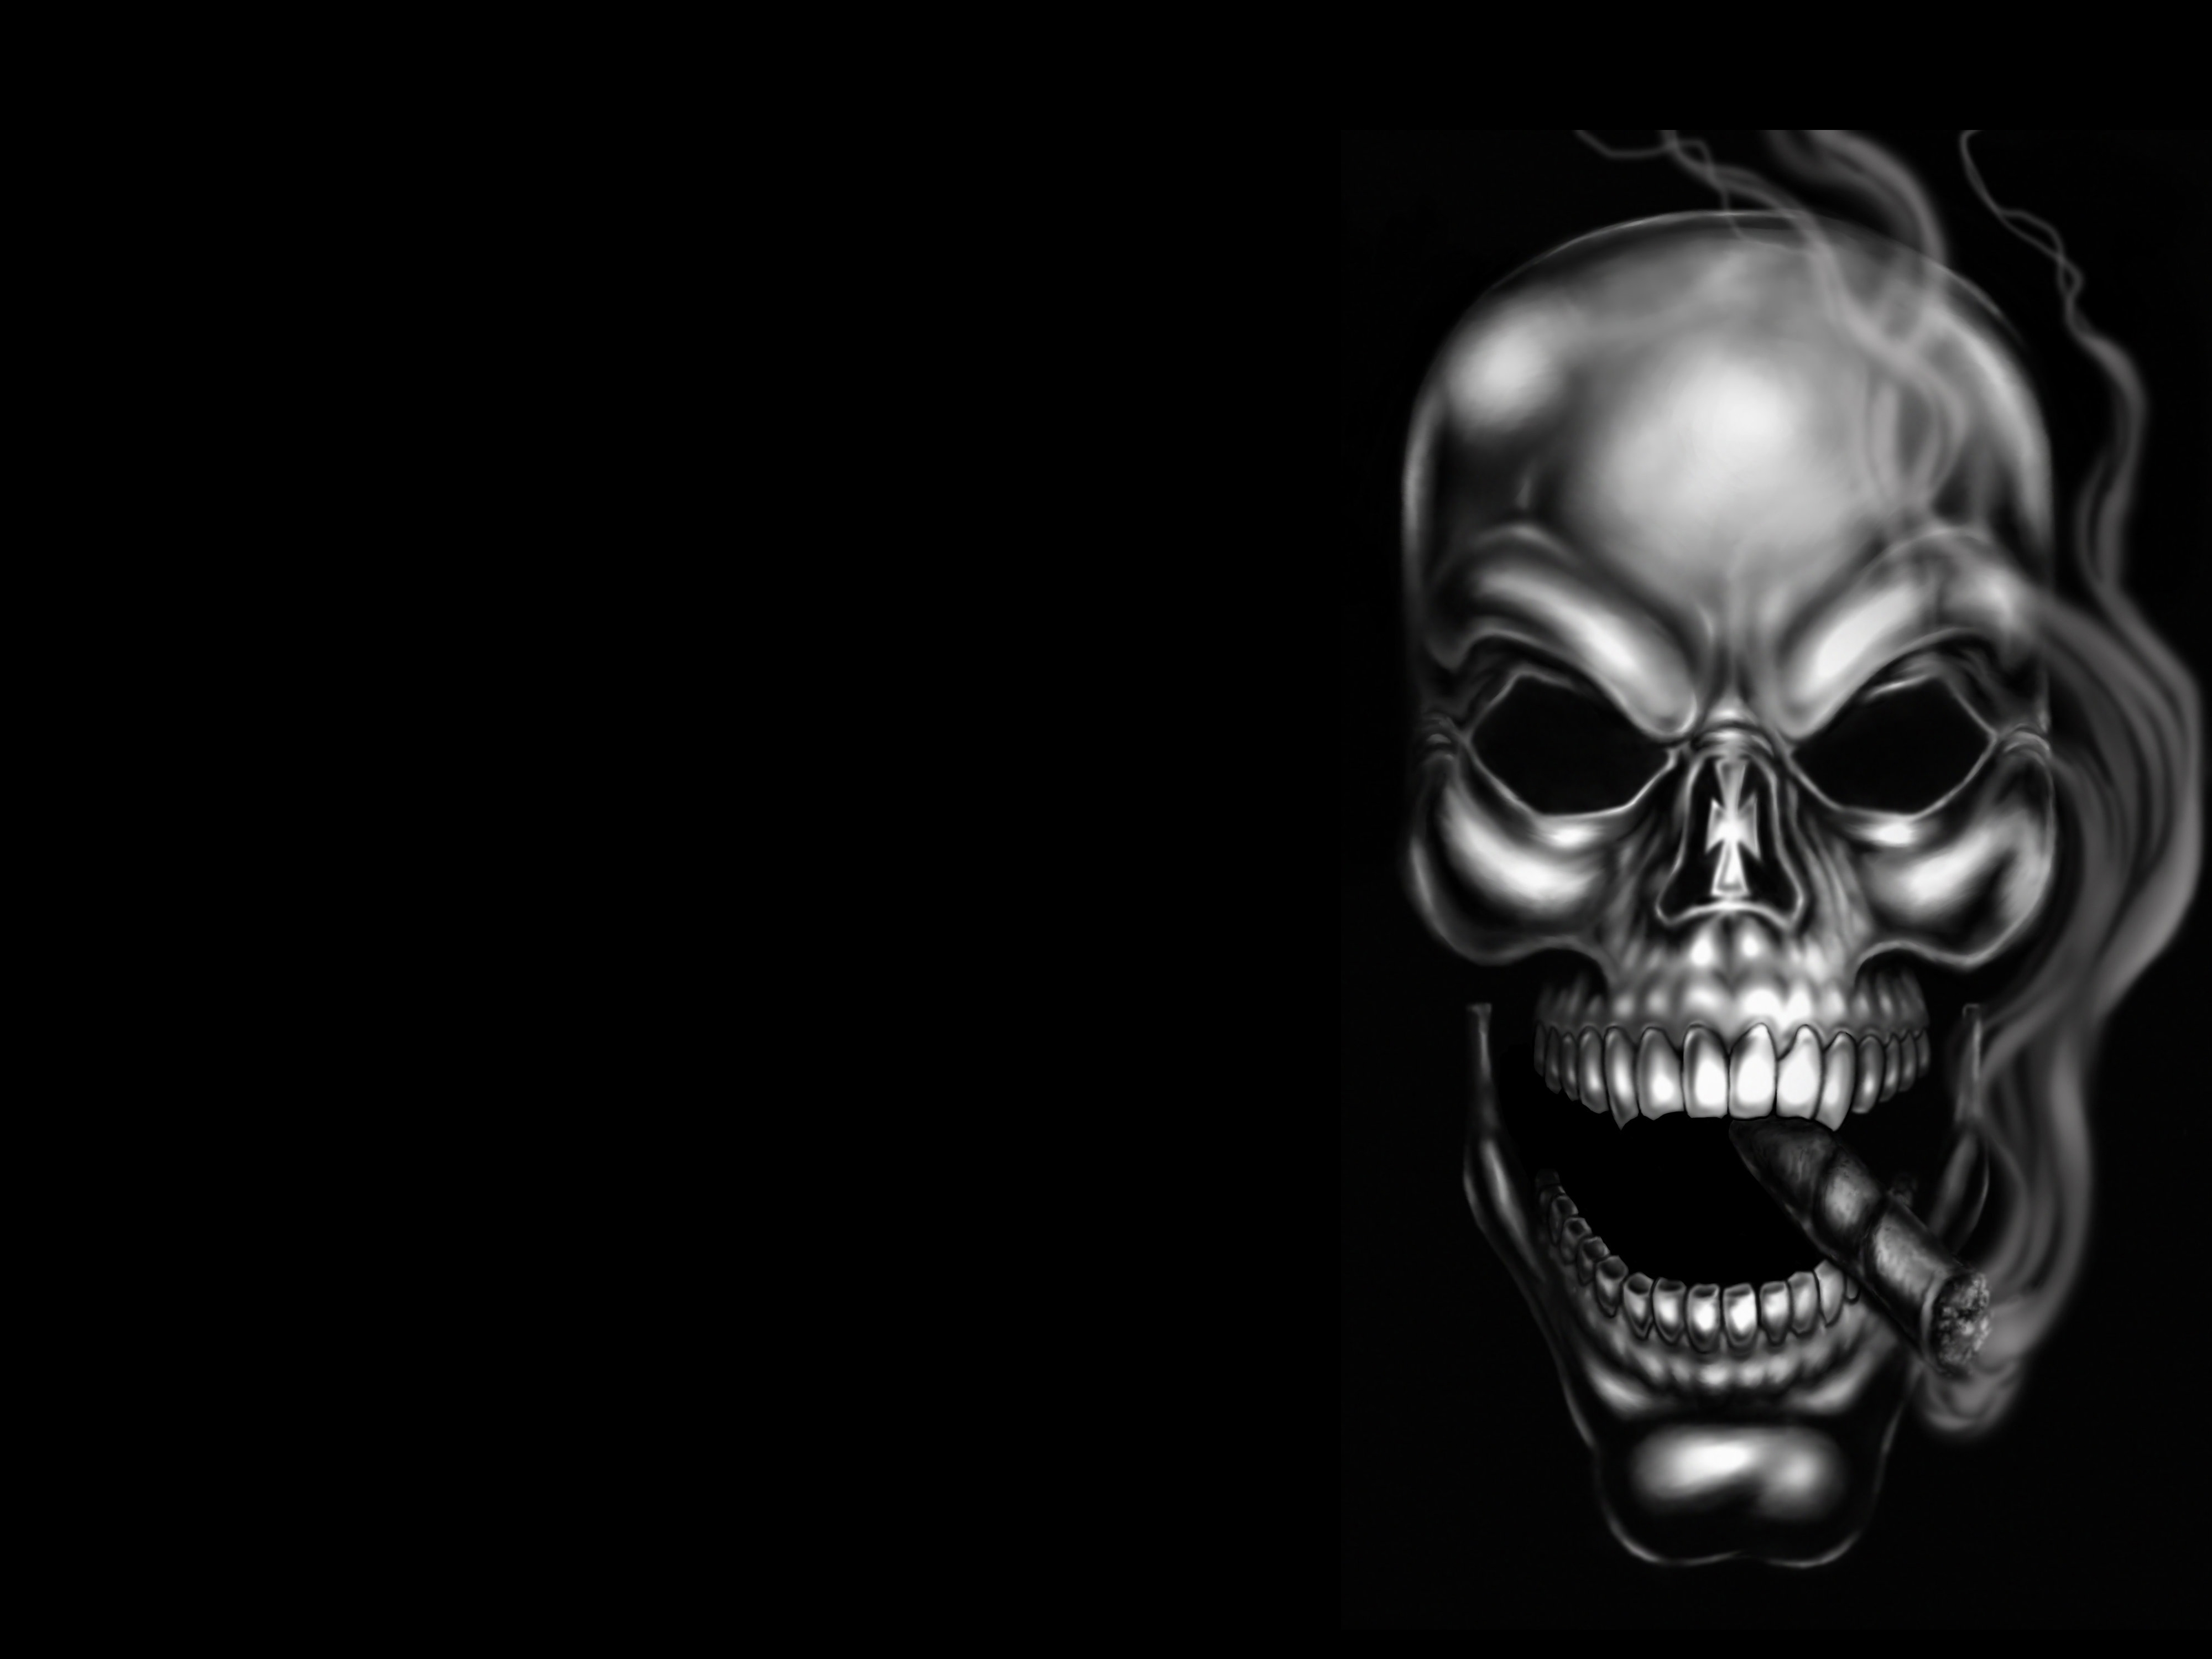 Skull And Bones Wallpaper Images TheCelebrityPix 4000x3000